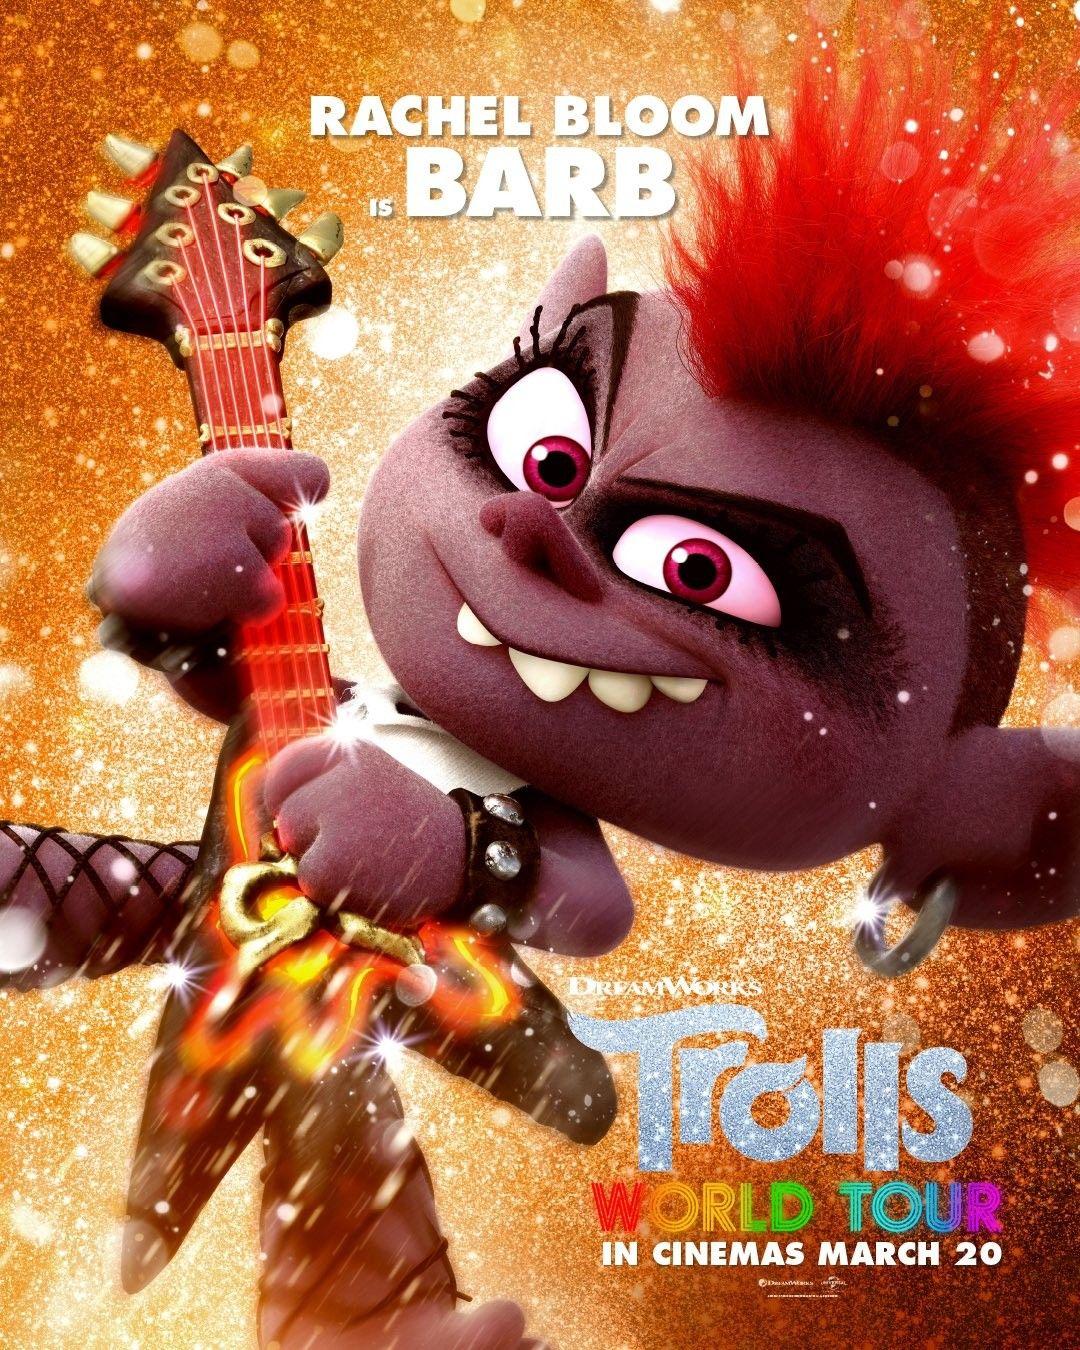 Trolls2 Novo Poster Filmes Online Gratis Festa De Aniversario Dos Trolls Fotos De Desenhos Animados